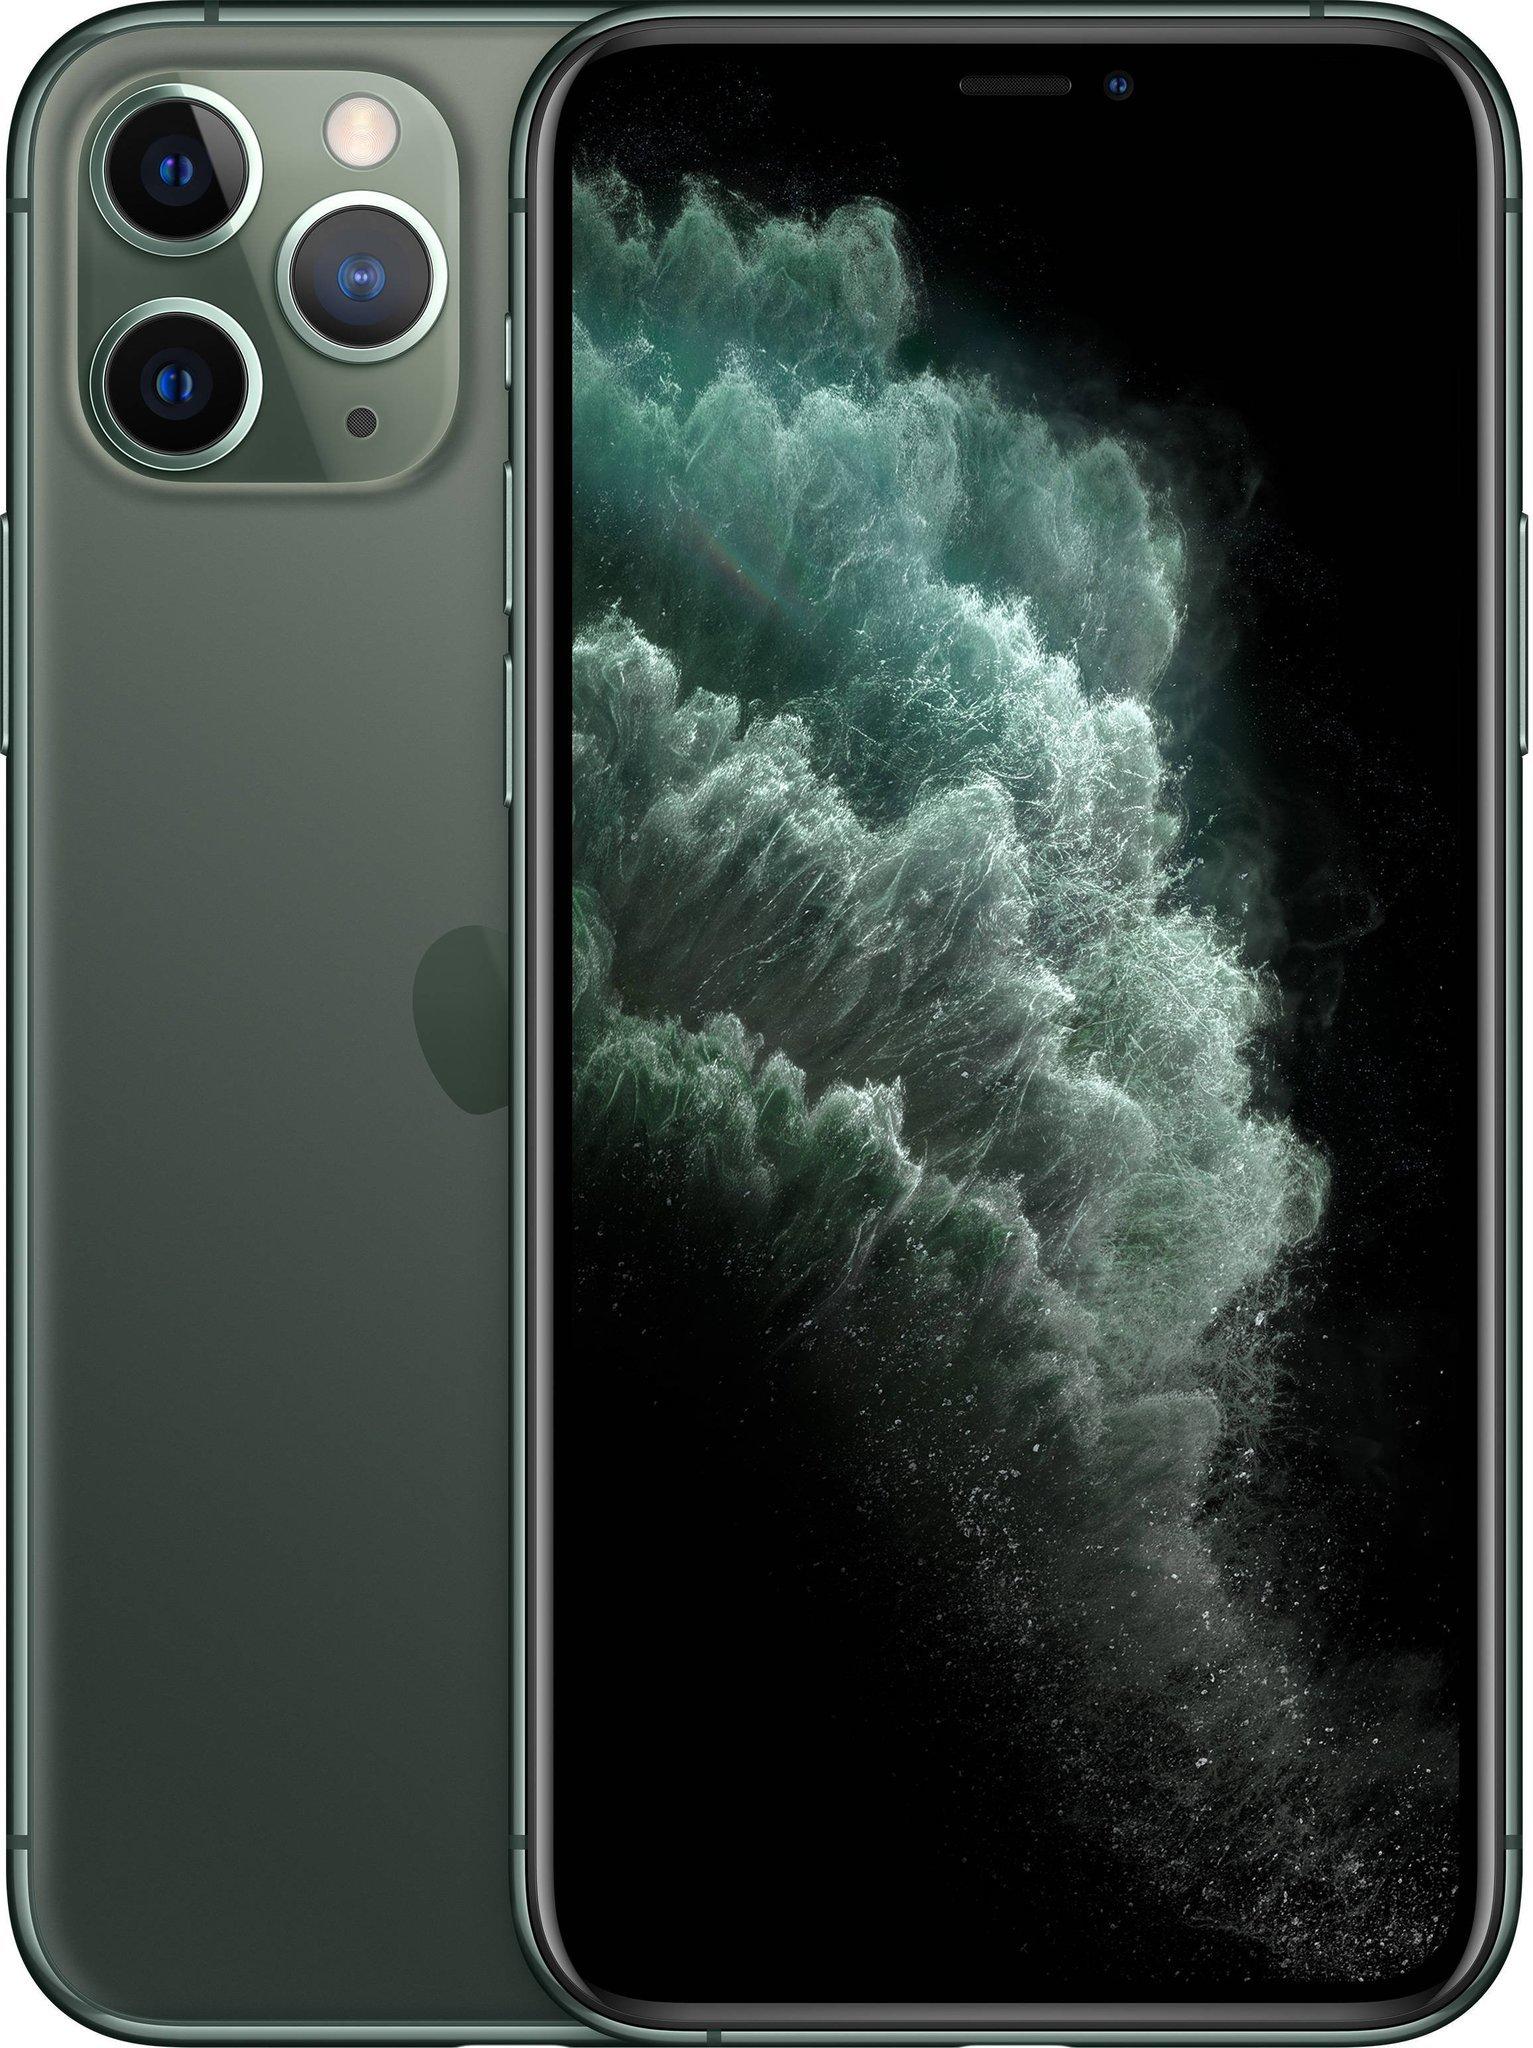 iPhone 11 Pro Apple iPhone 11 Pro 64gb Темно-зеленый green1.jpg